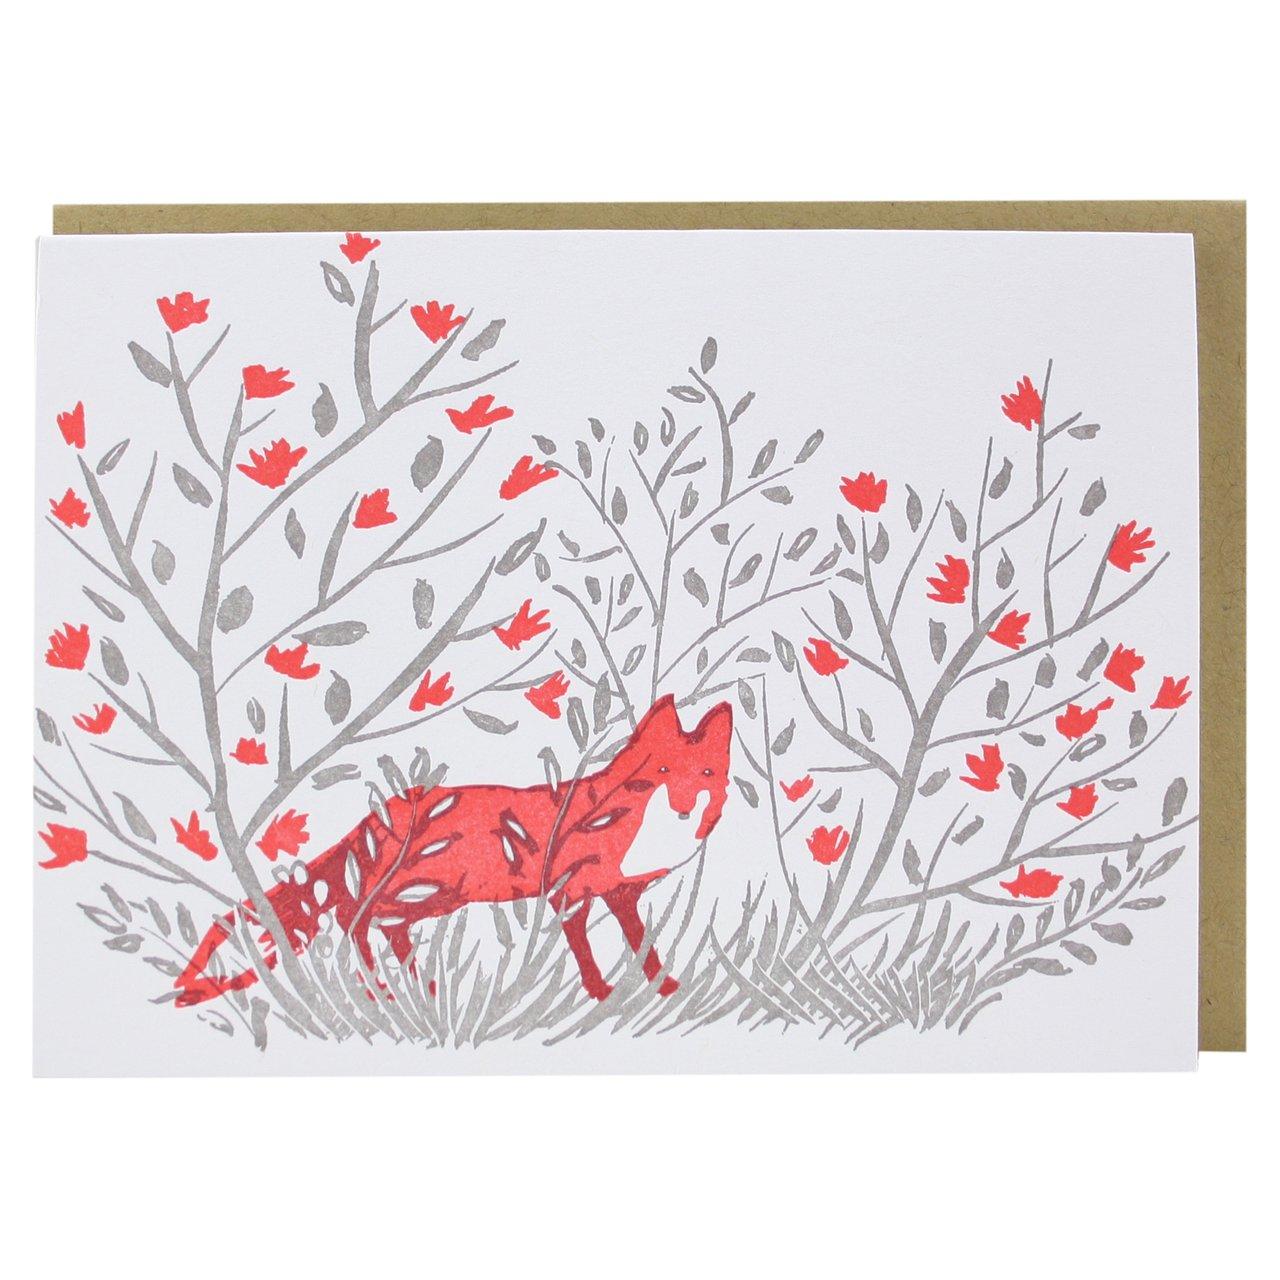 fox-in-forest-note-card_1280x1280.jpg